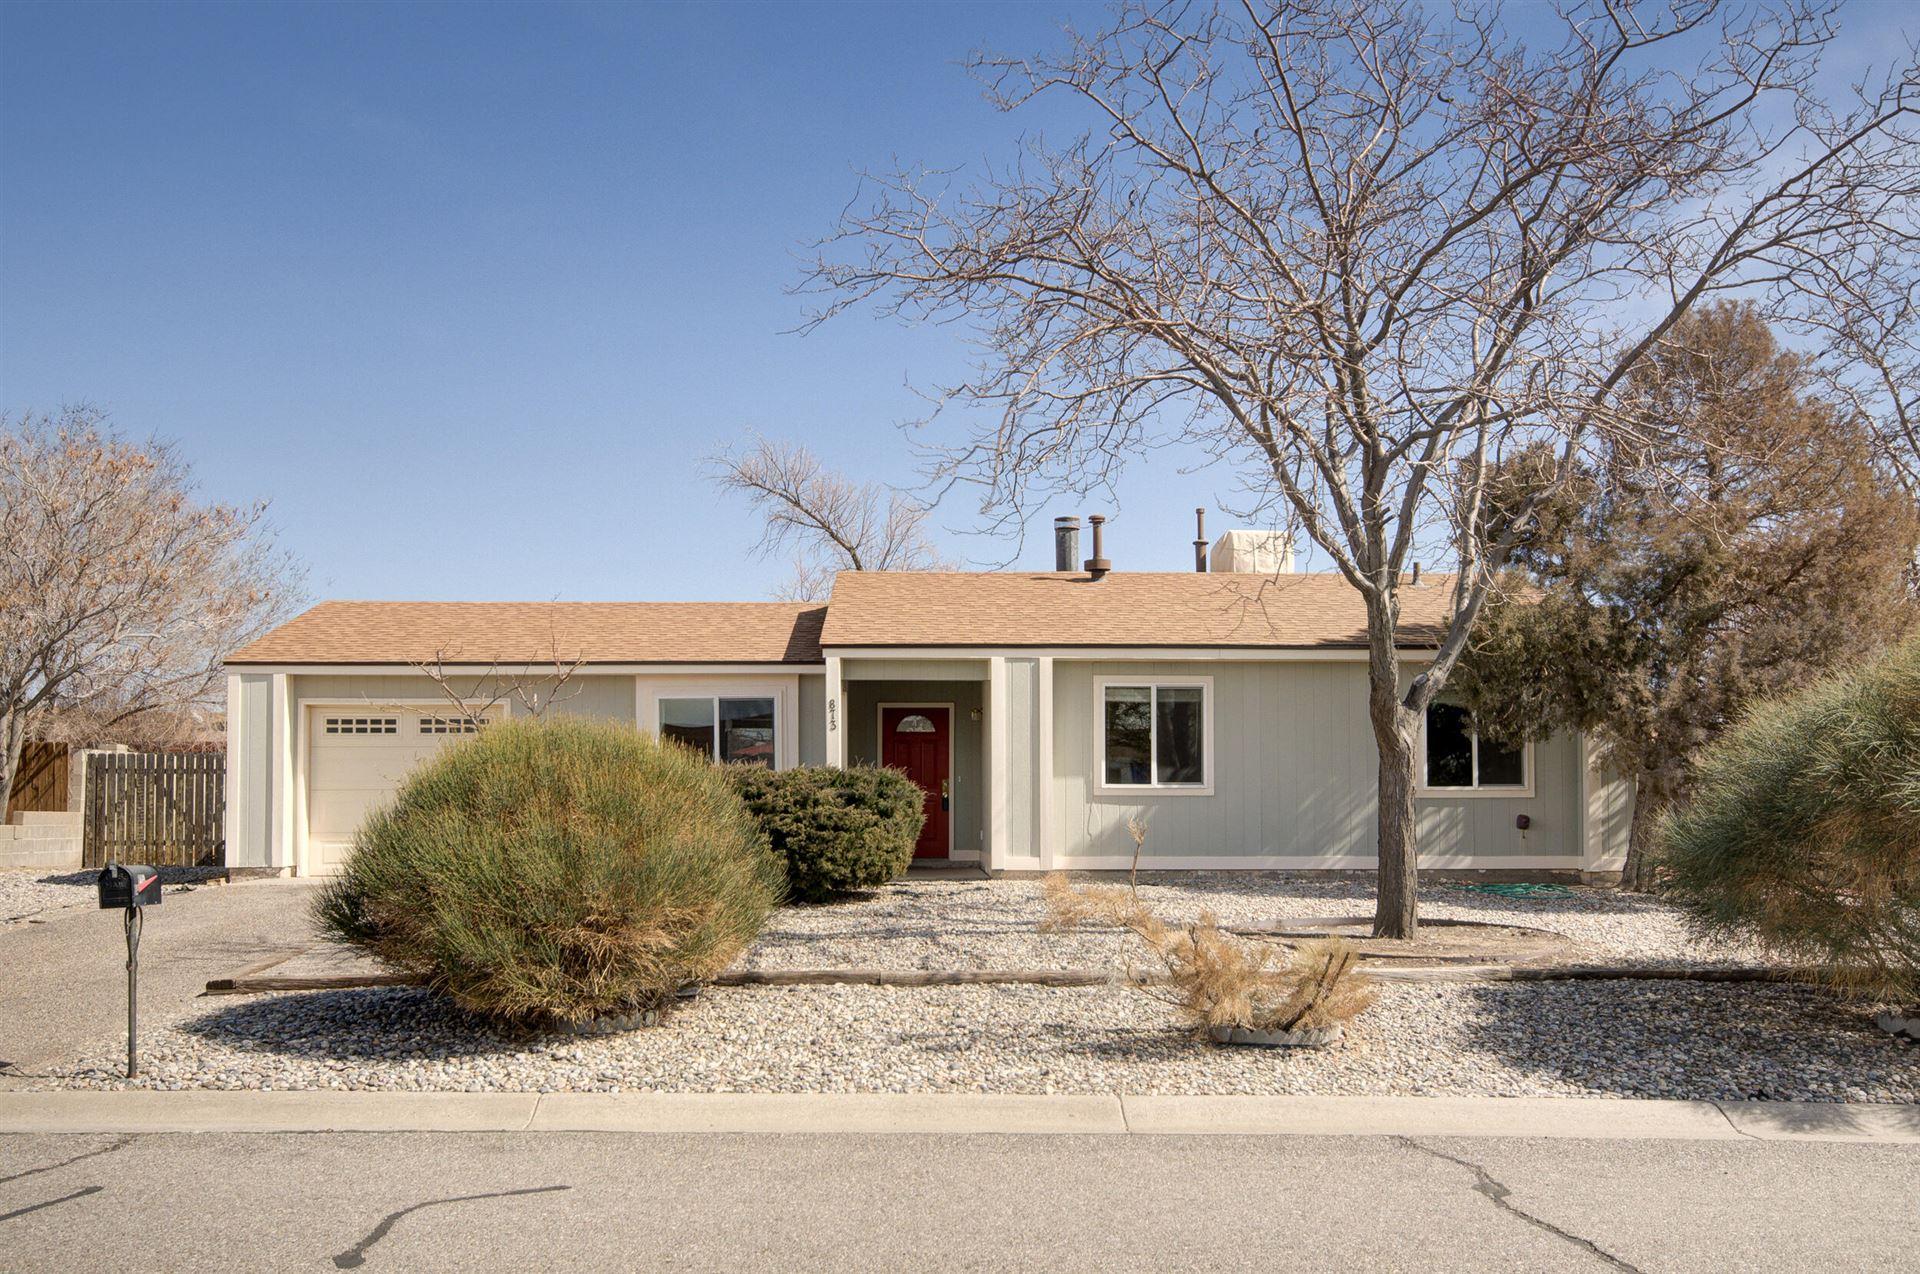 873 MADEIRA Drive SE, Rio Rancho, NM 87124 - MLS#: 986548